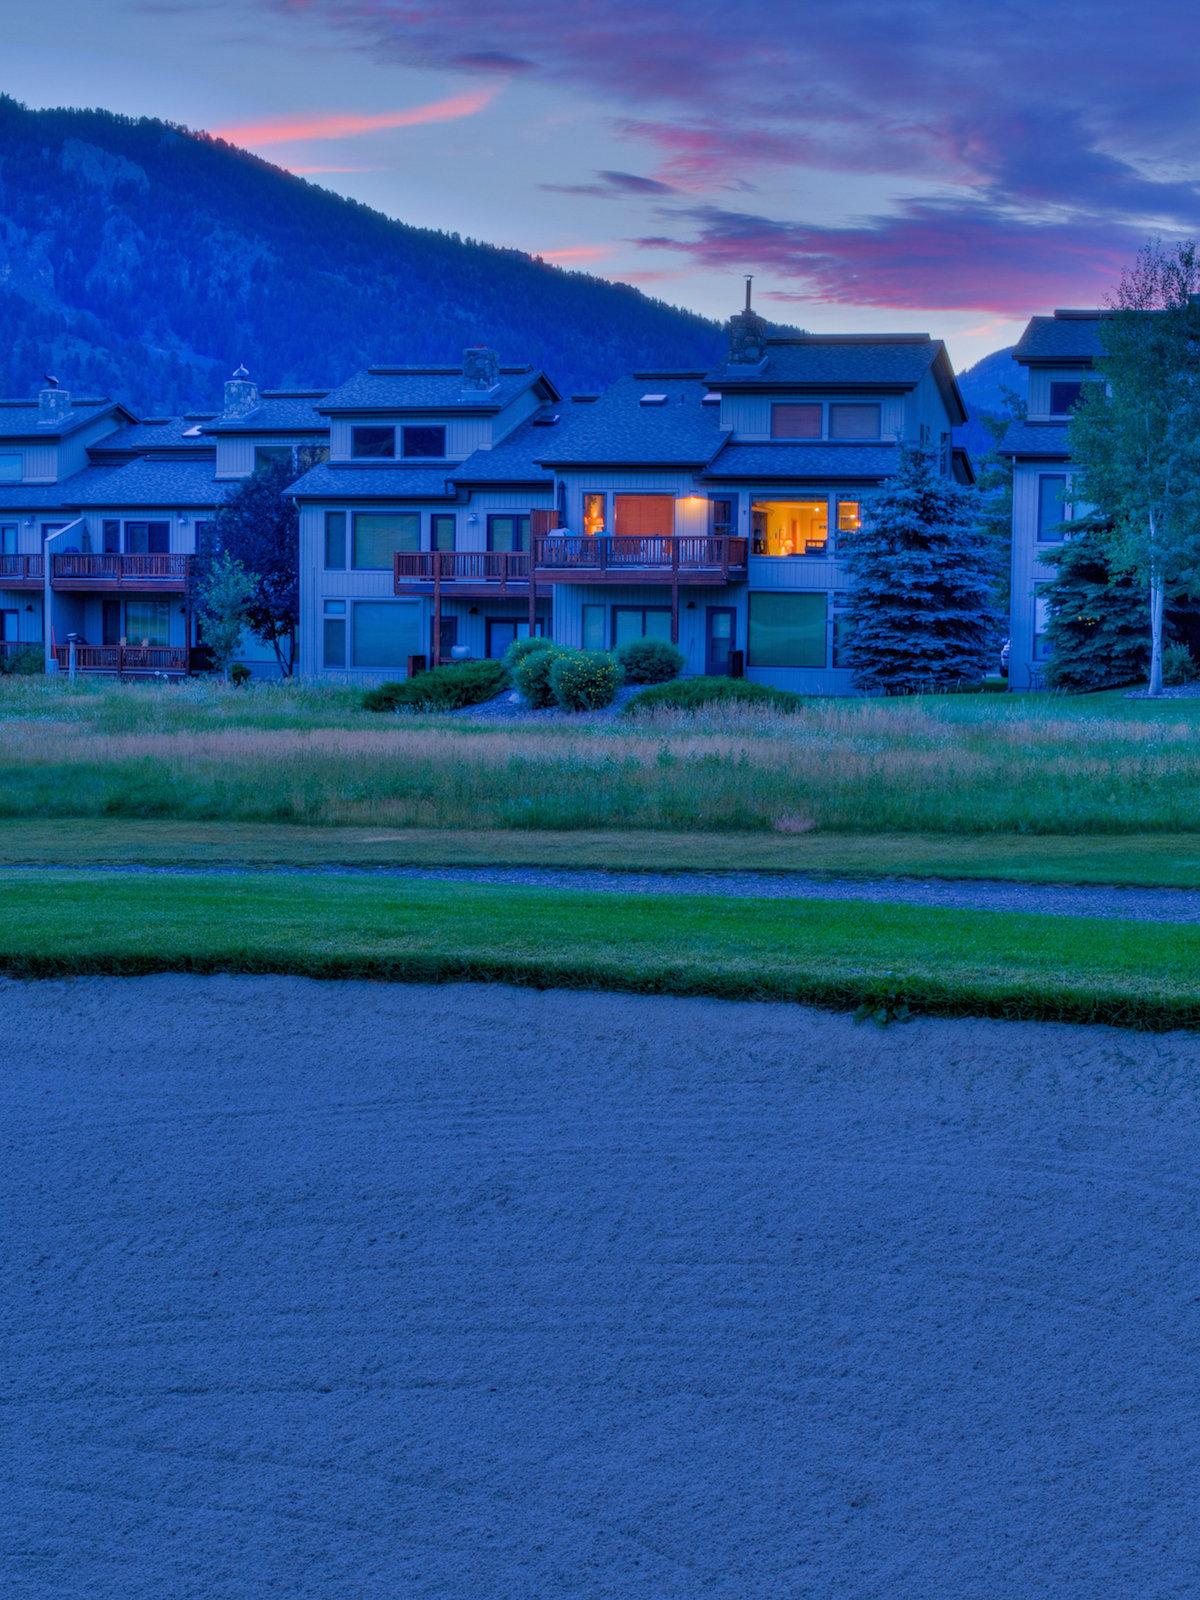 Property Of Park Golf Condominiums